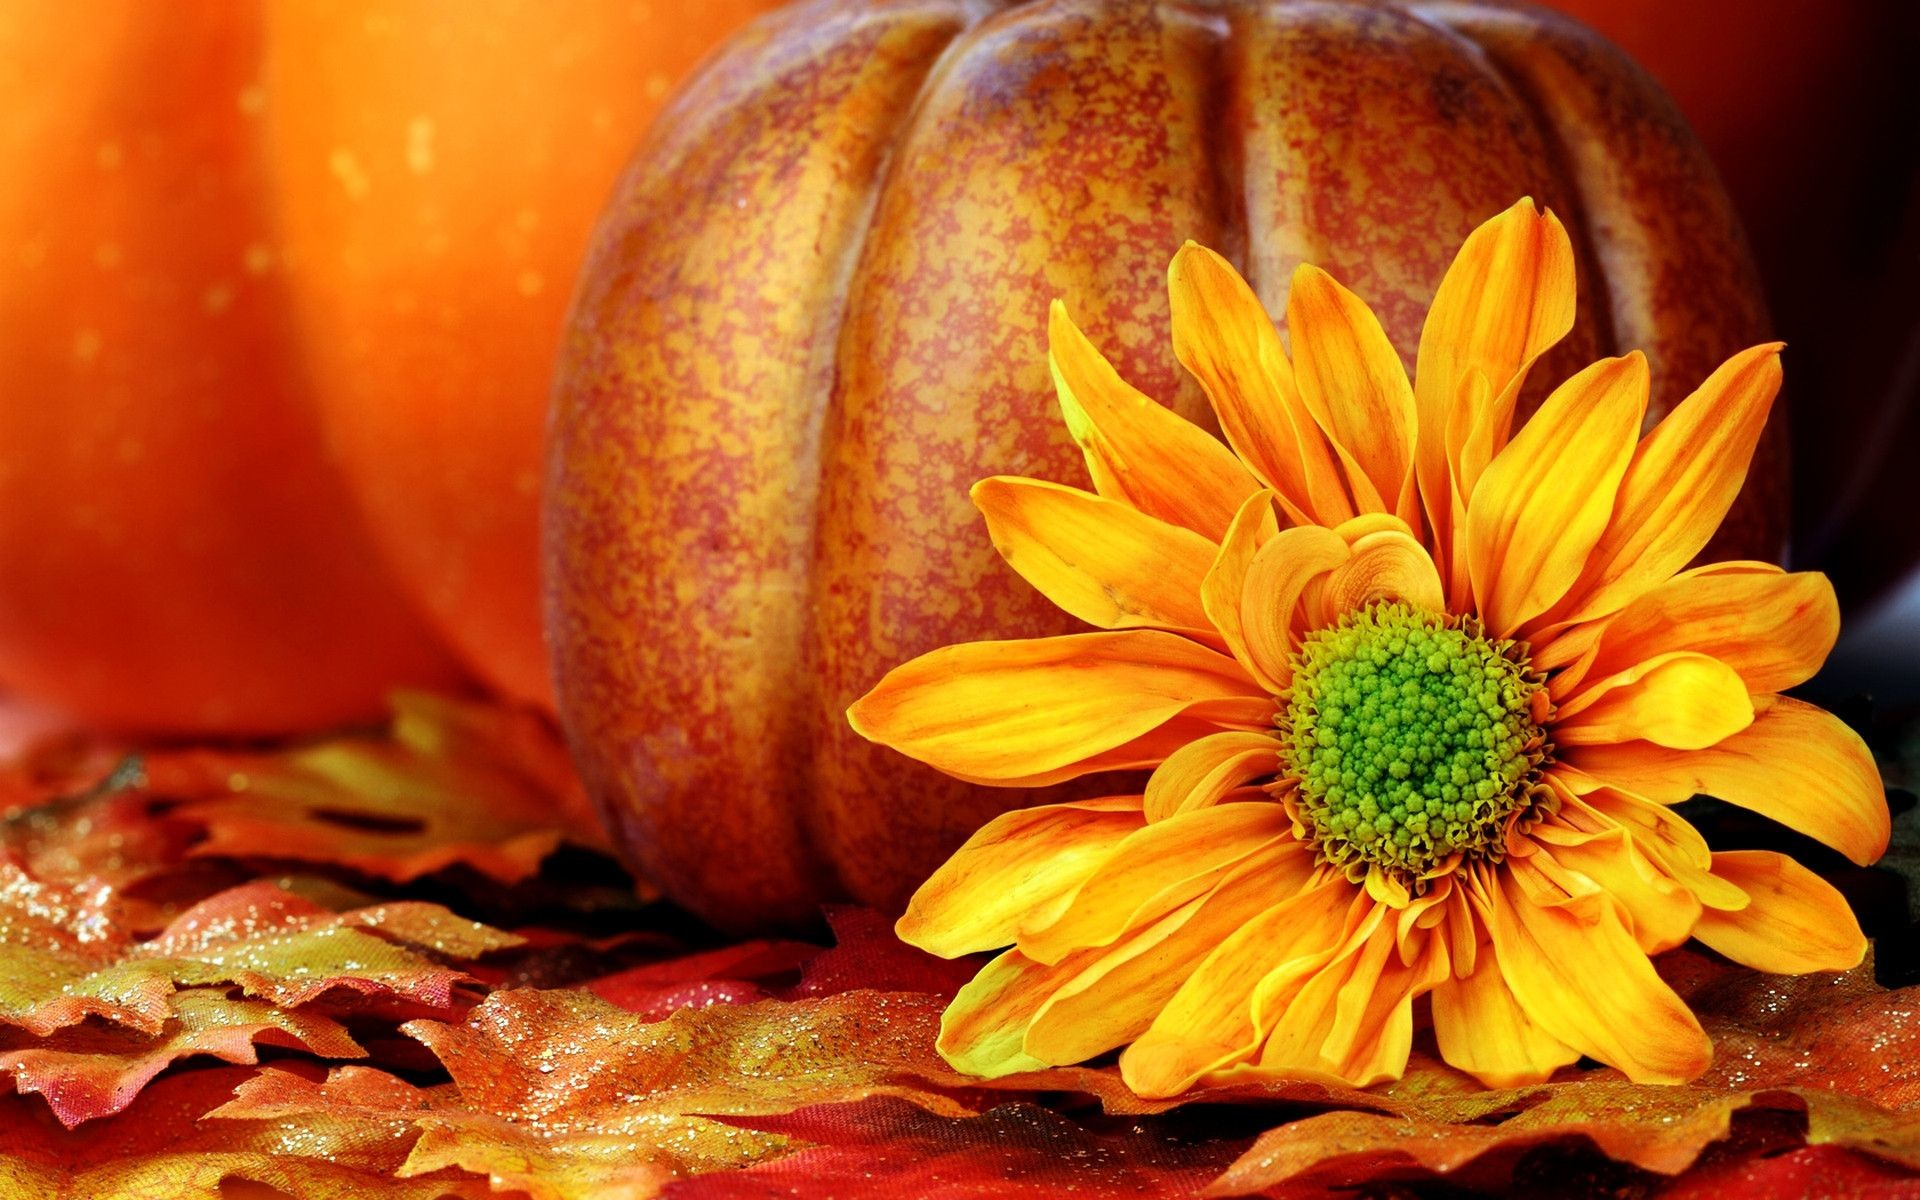 Free Desktop HD Pumpkin Wallpapers.